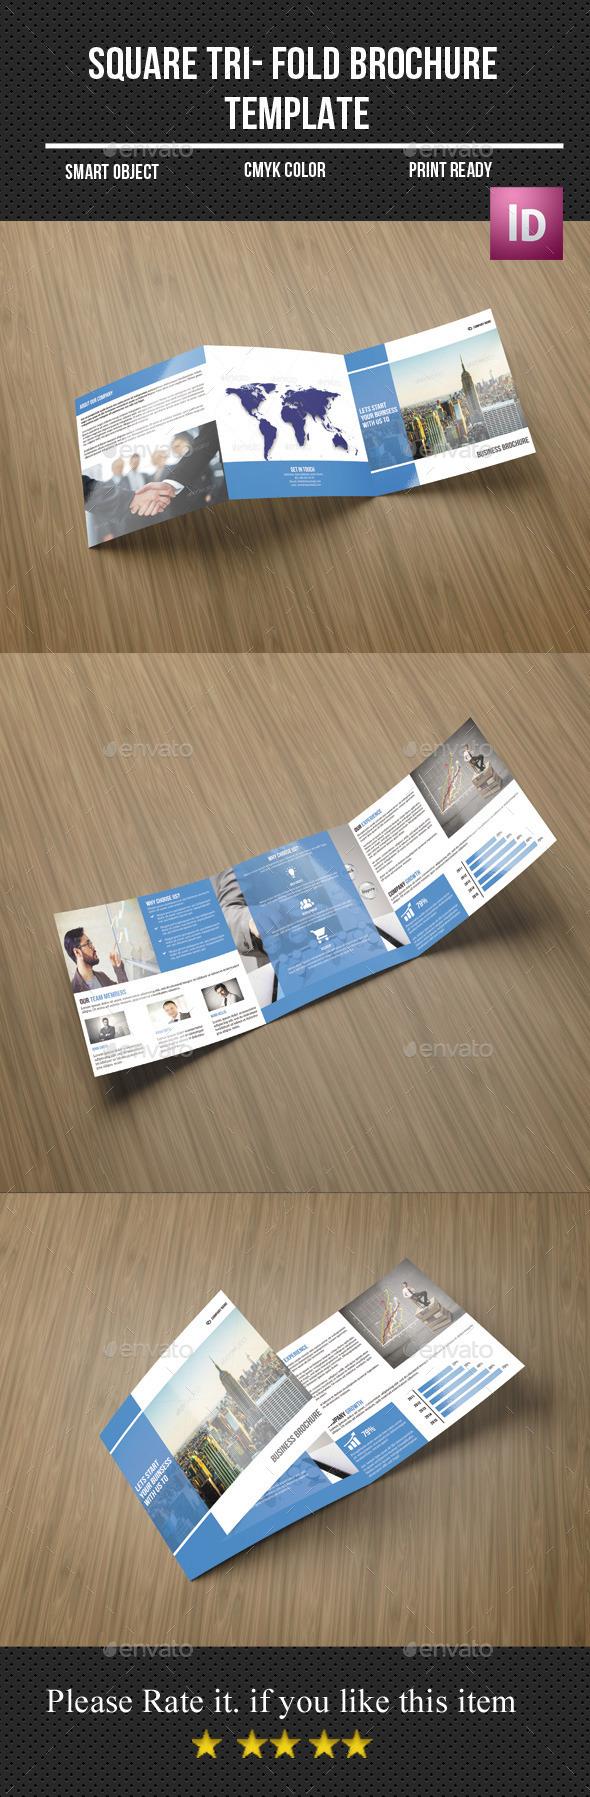 Corporate Square Tri - Fold Brochure - Corporate Brochures